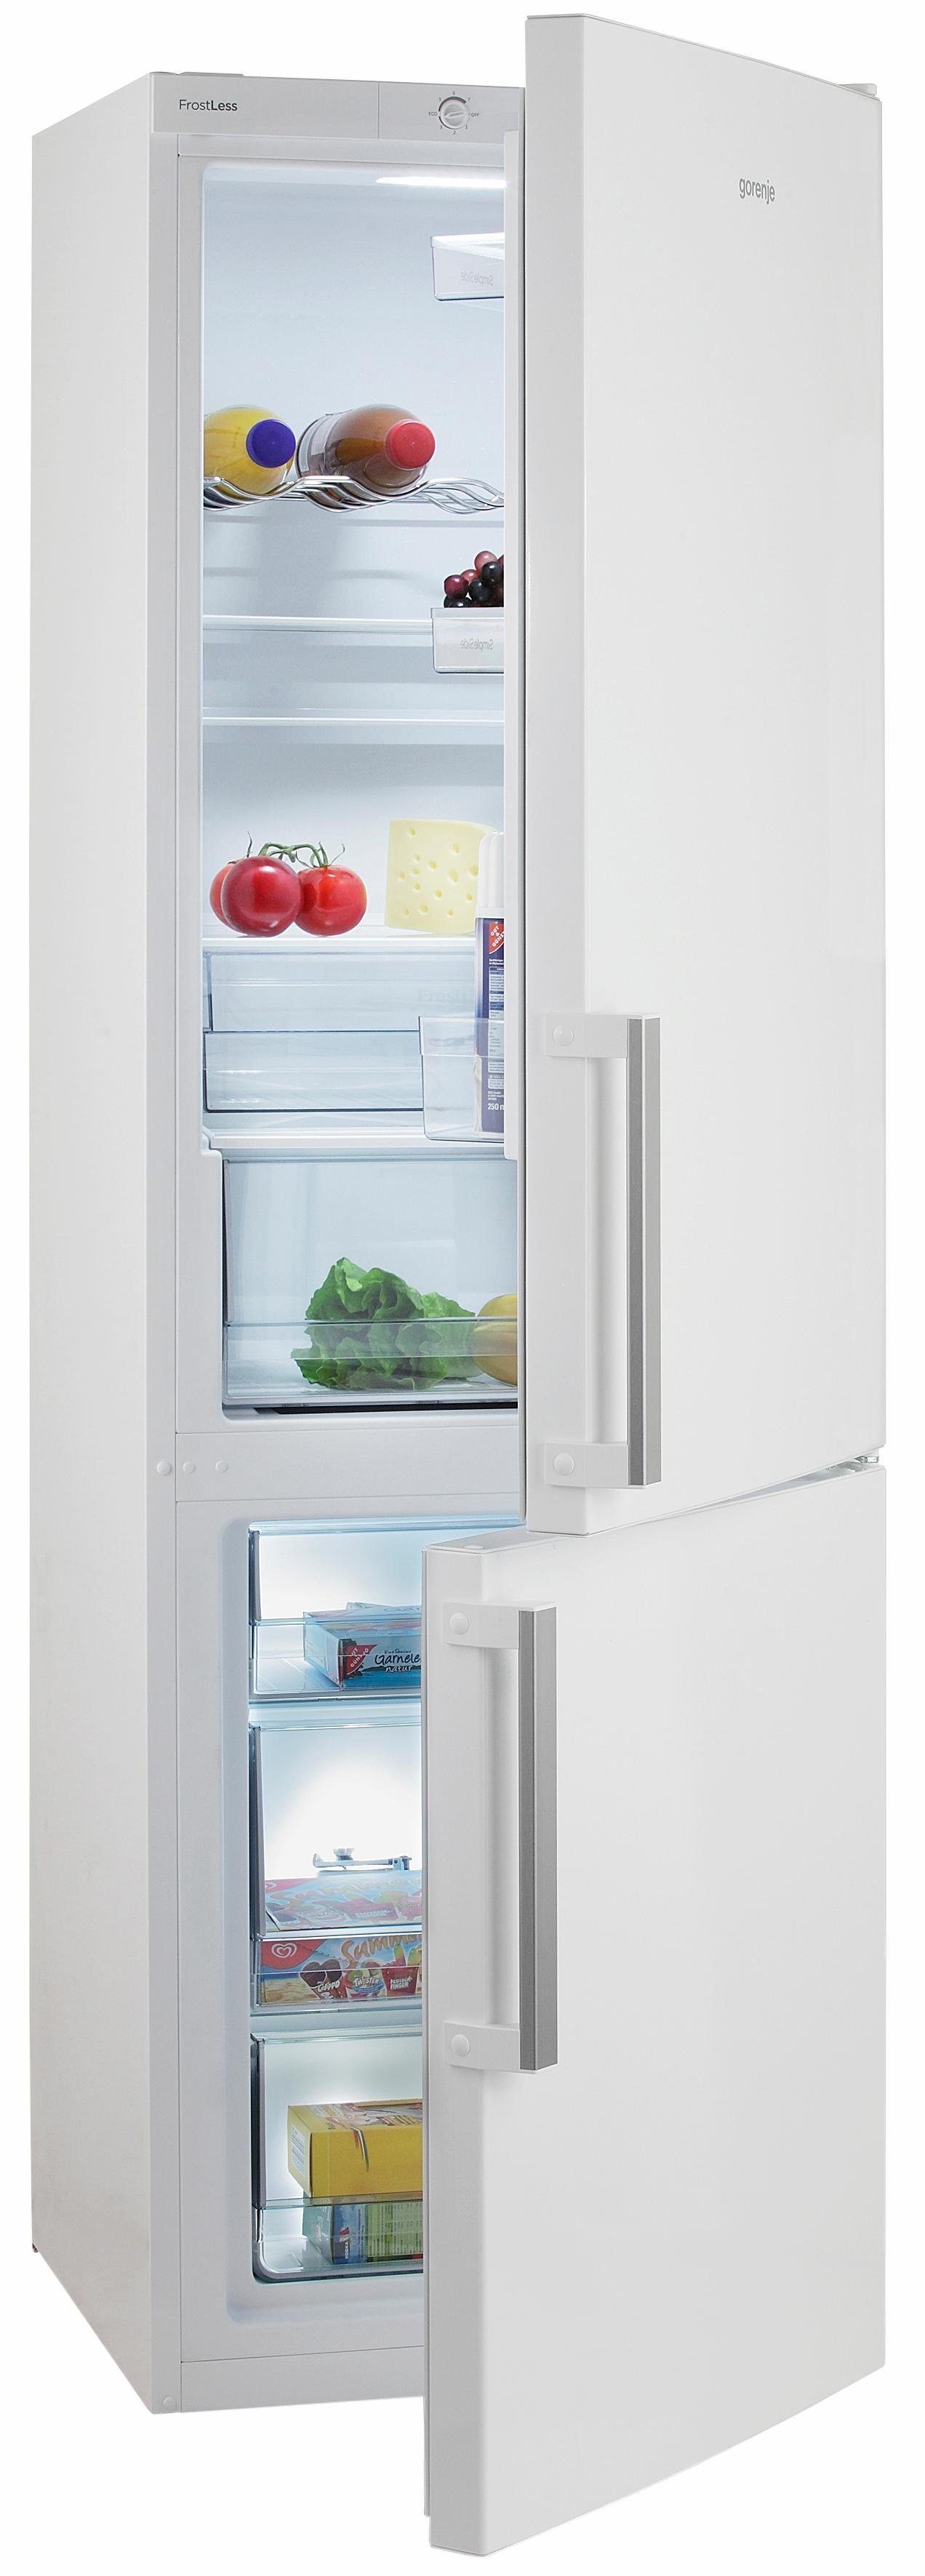 gorenje kühl-gefrierkombination